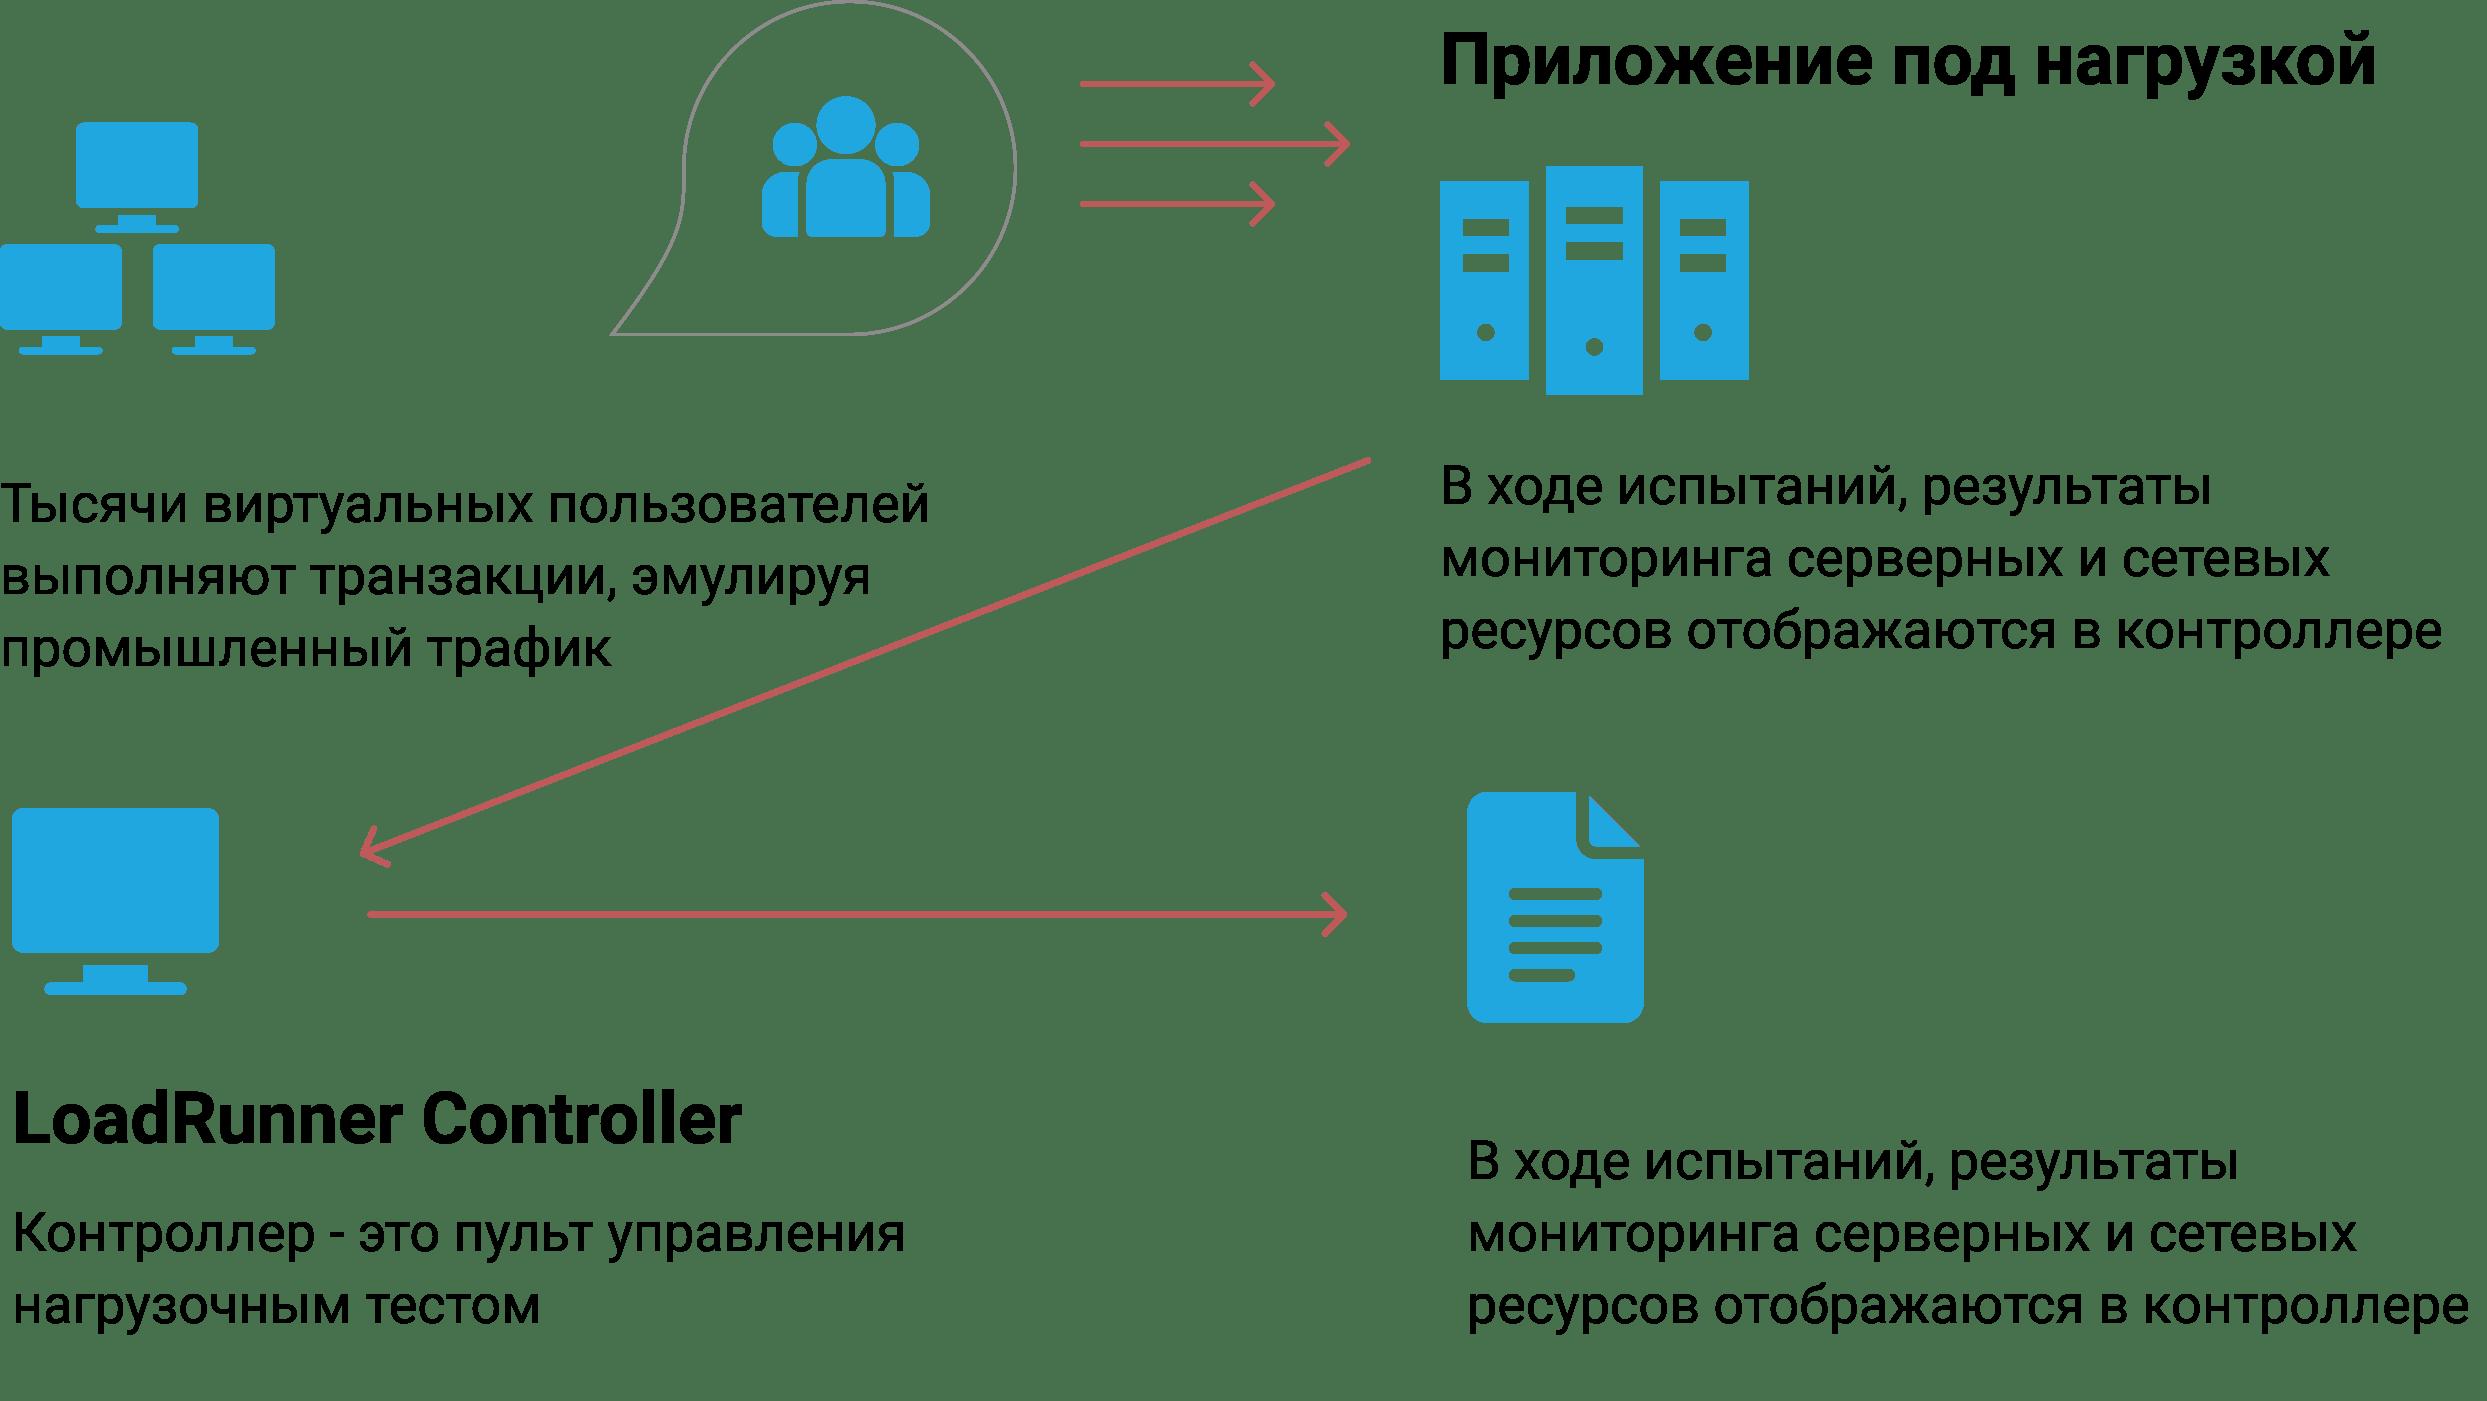 IVR тестирование с помощью Load Runner